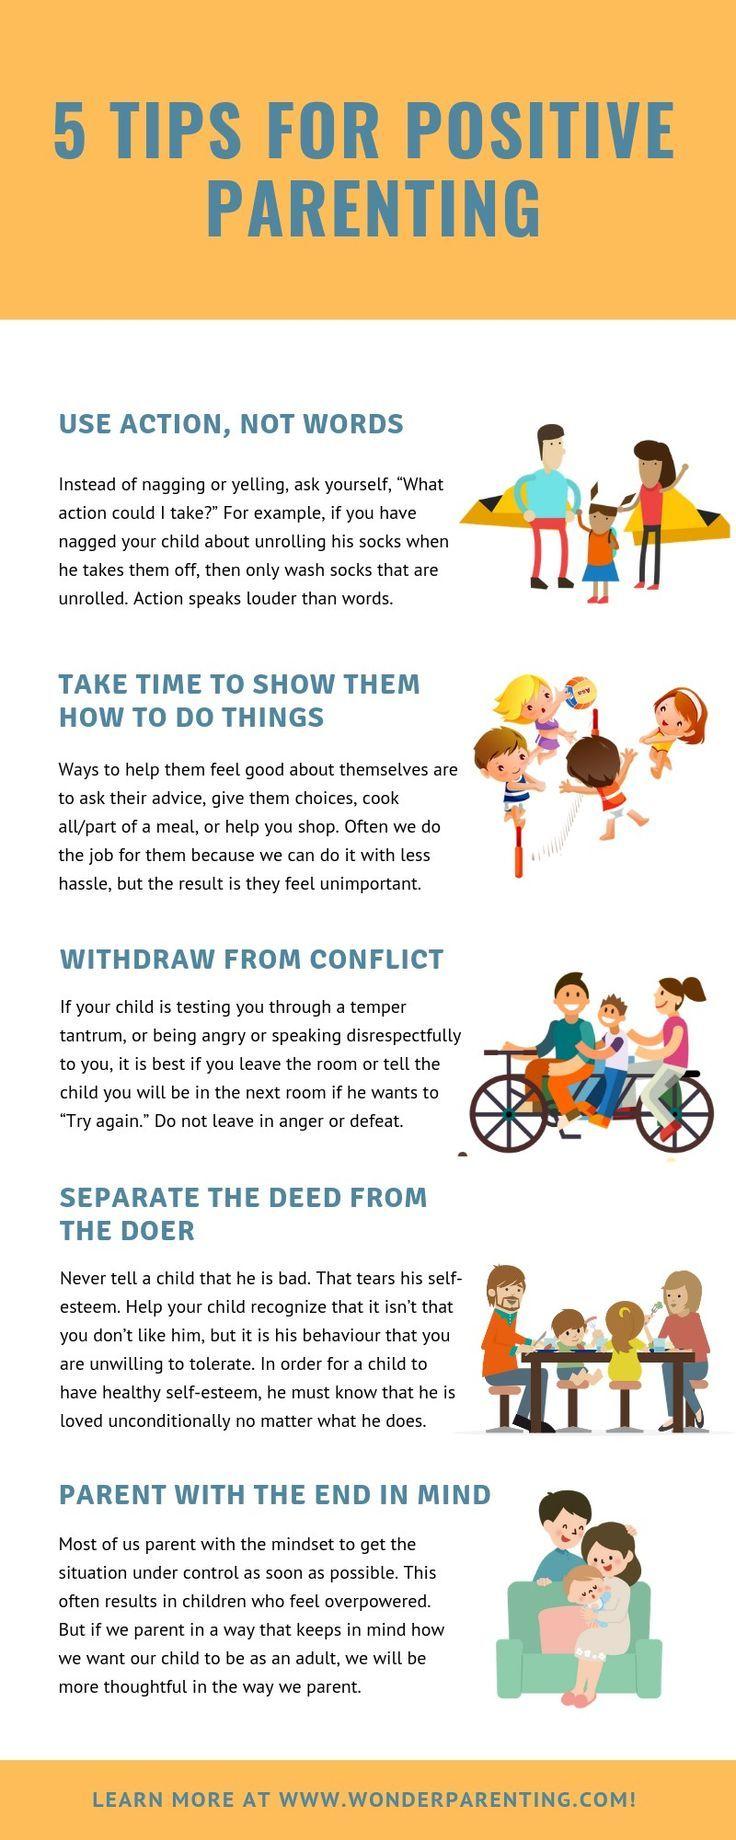 Photo of Best Parenting Tips, Parenting Blog for Parents- WonderParenting.com